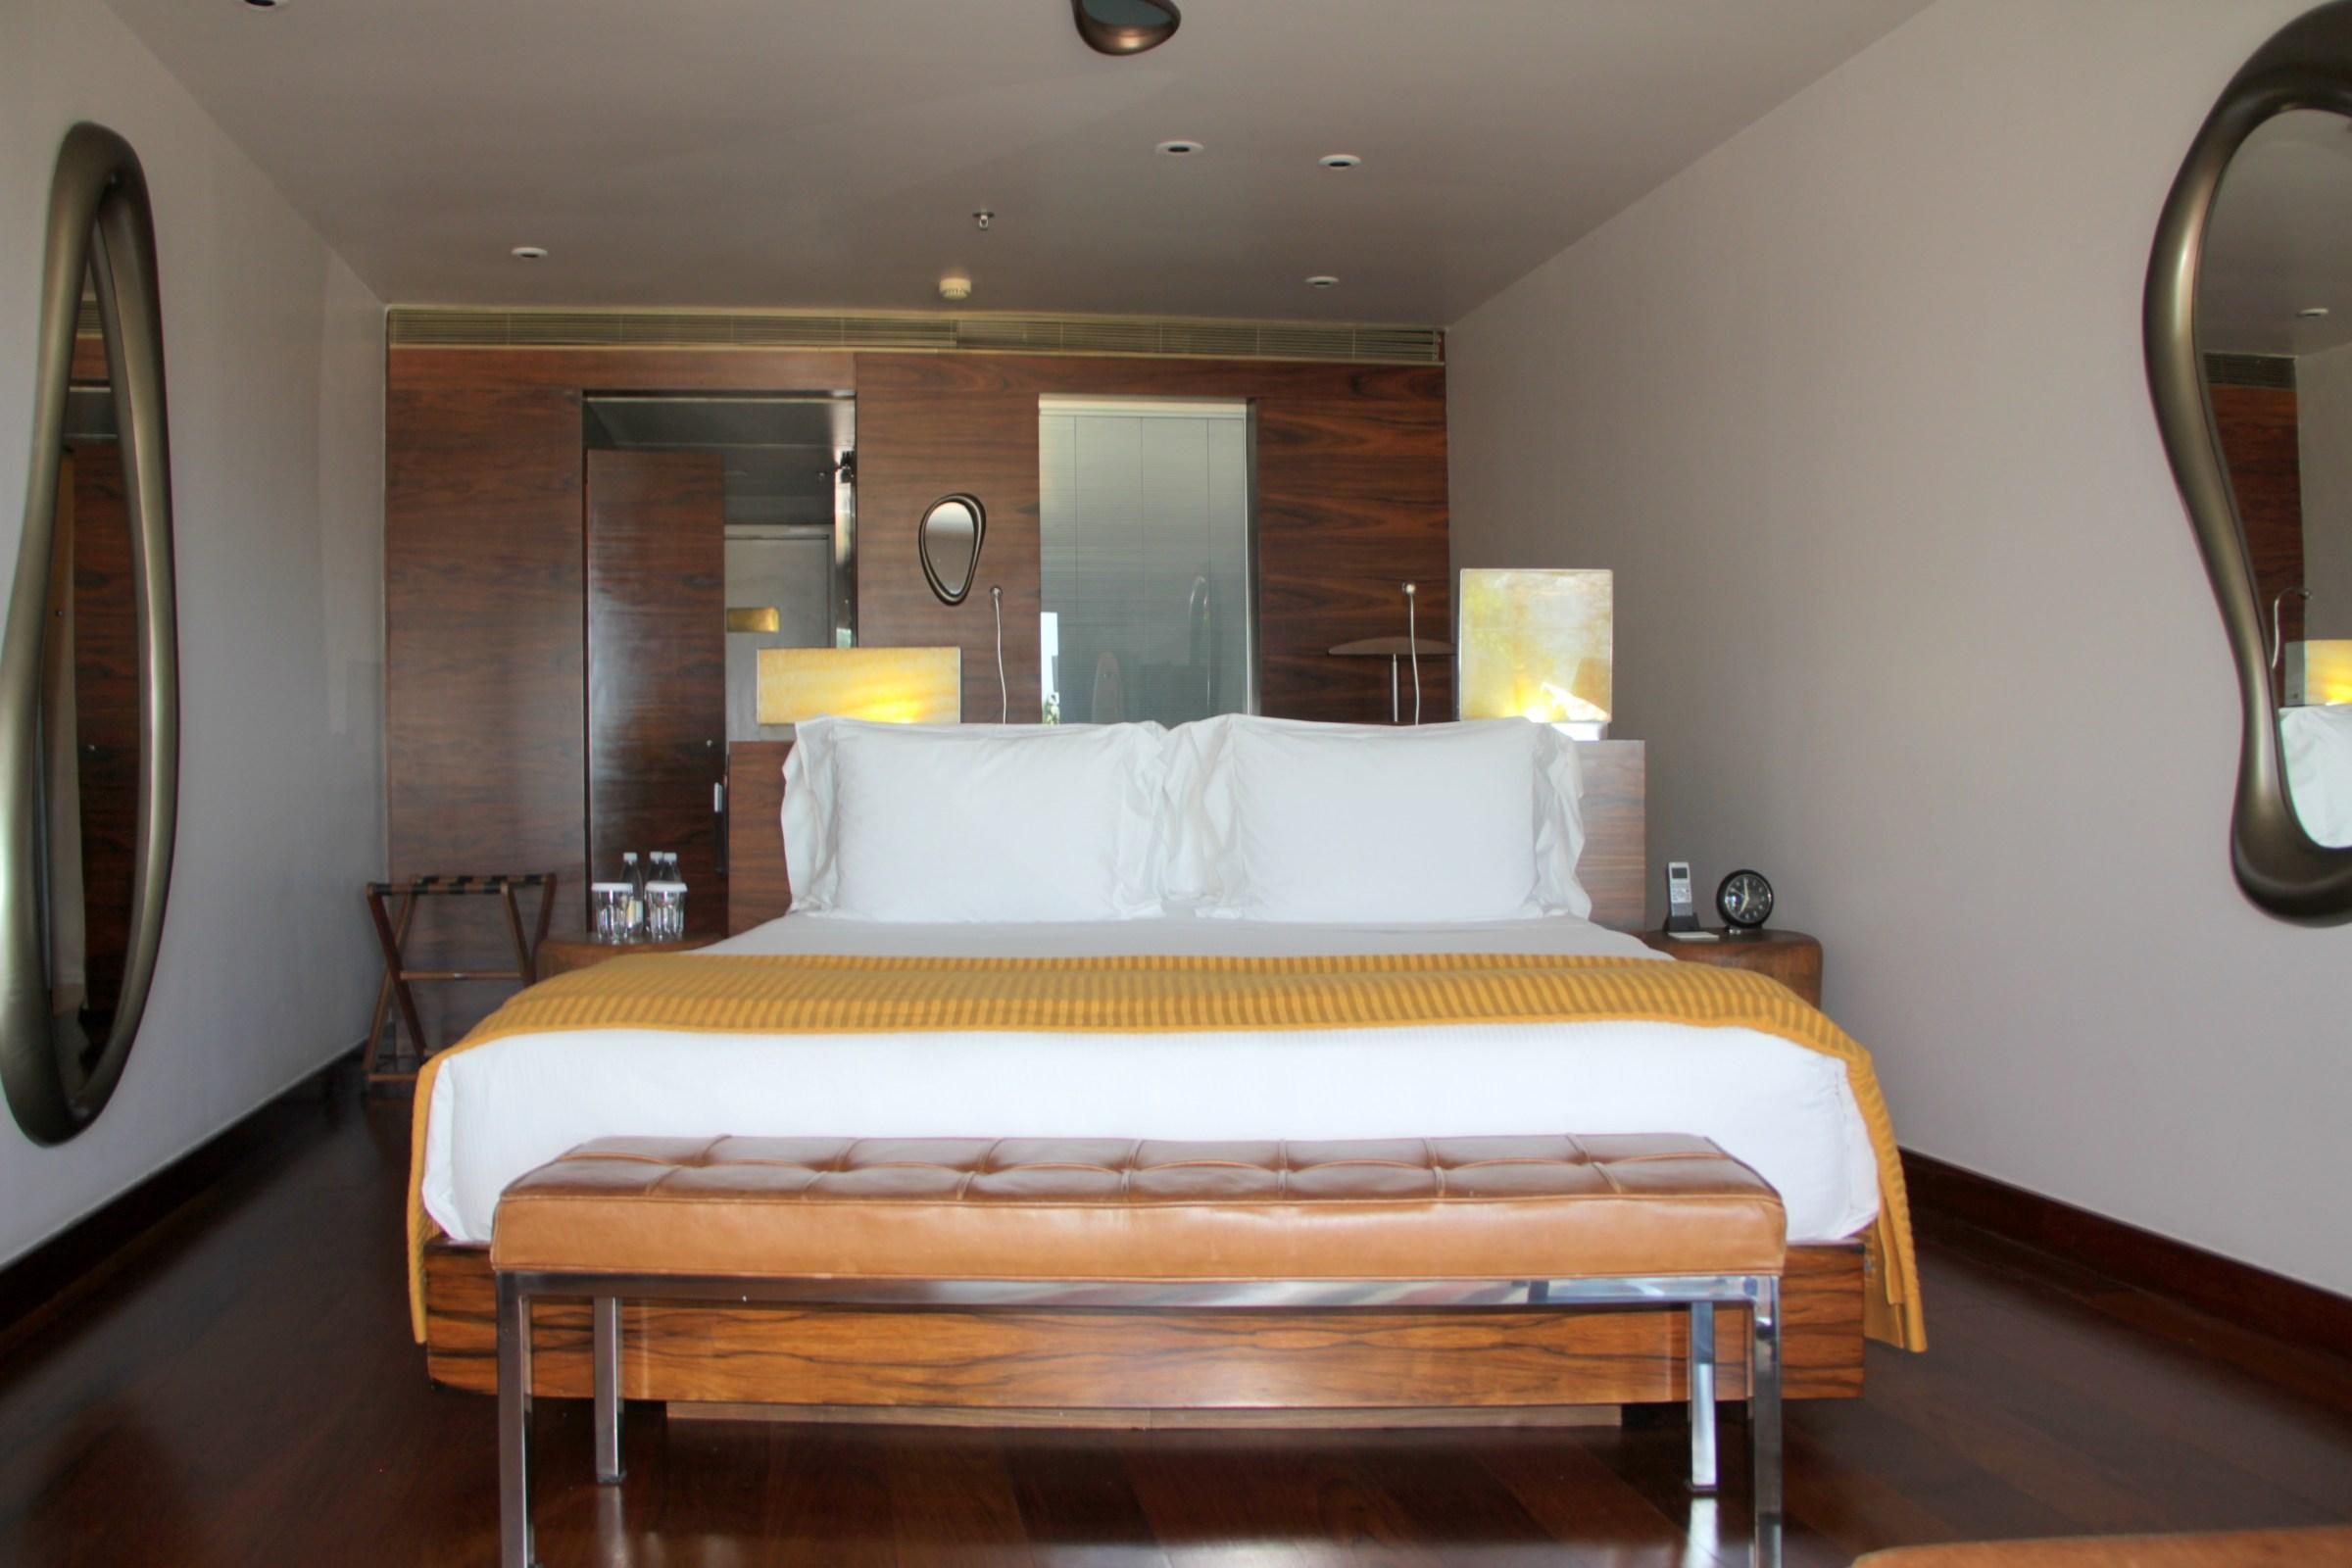 Hotel Fasano Rio de Janeiro Deluxe Room